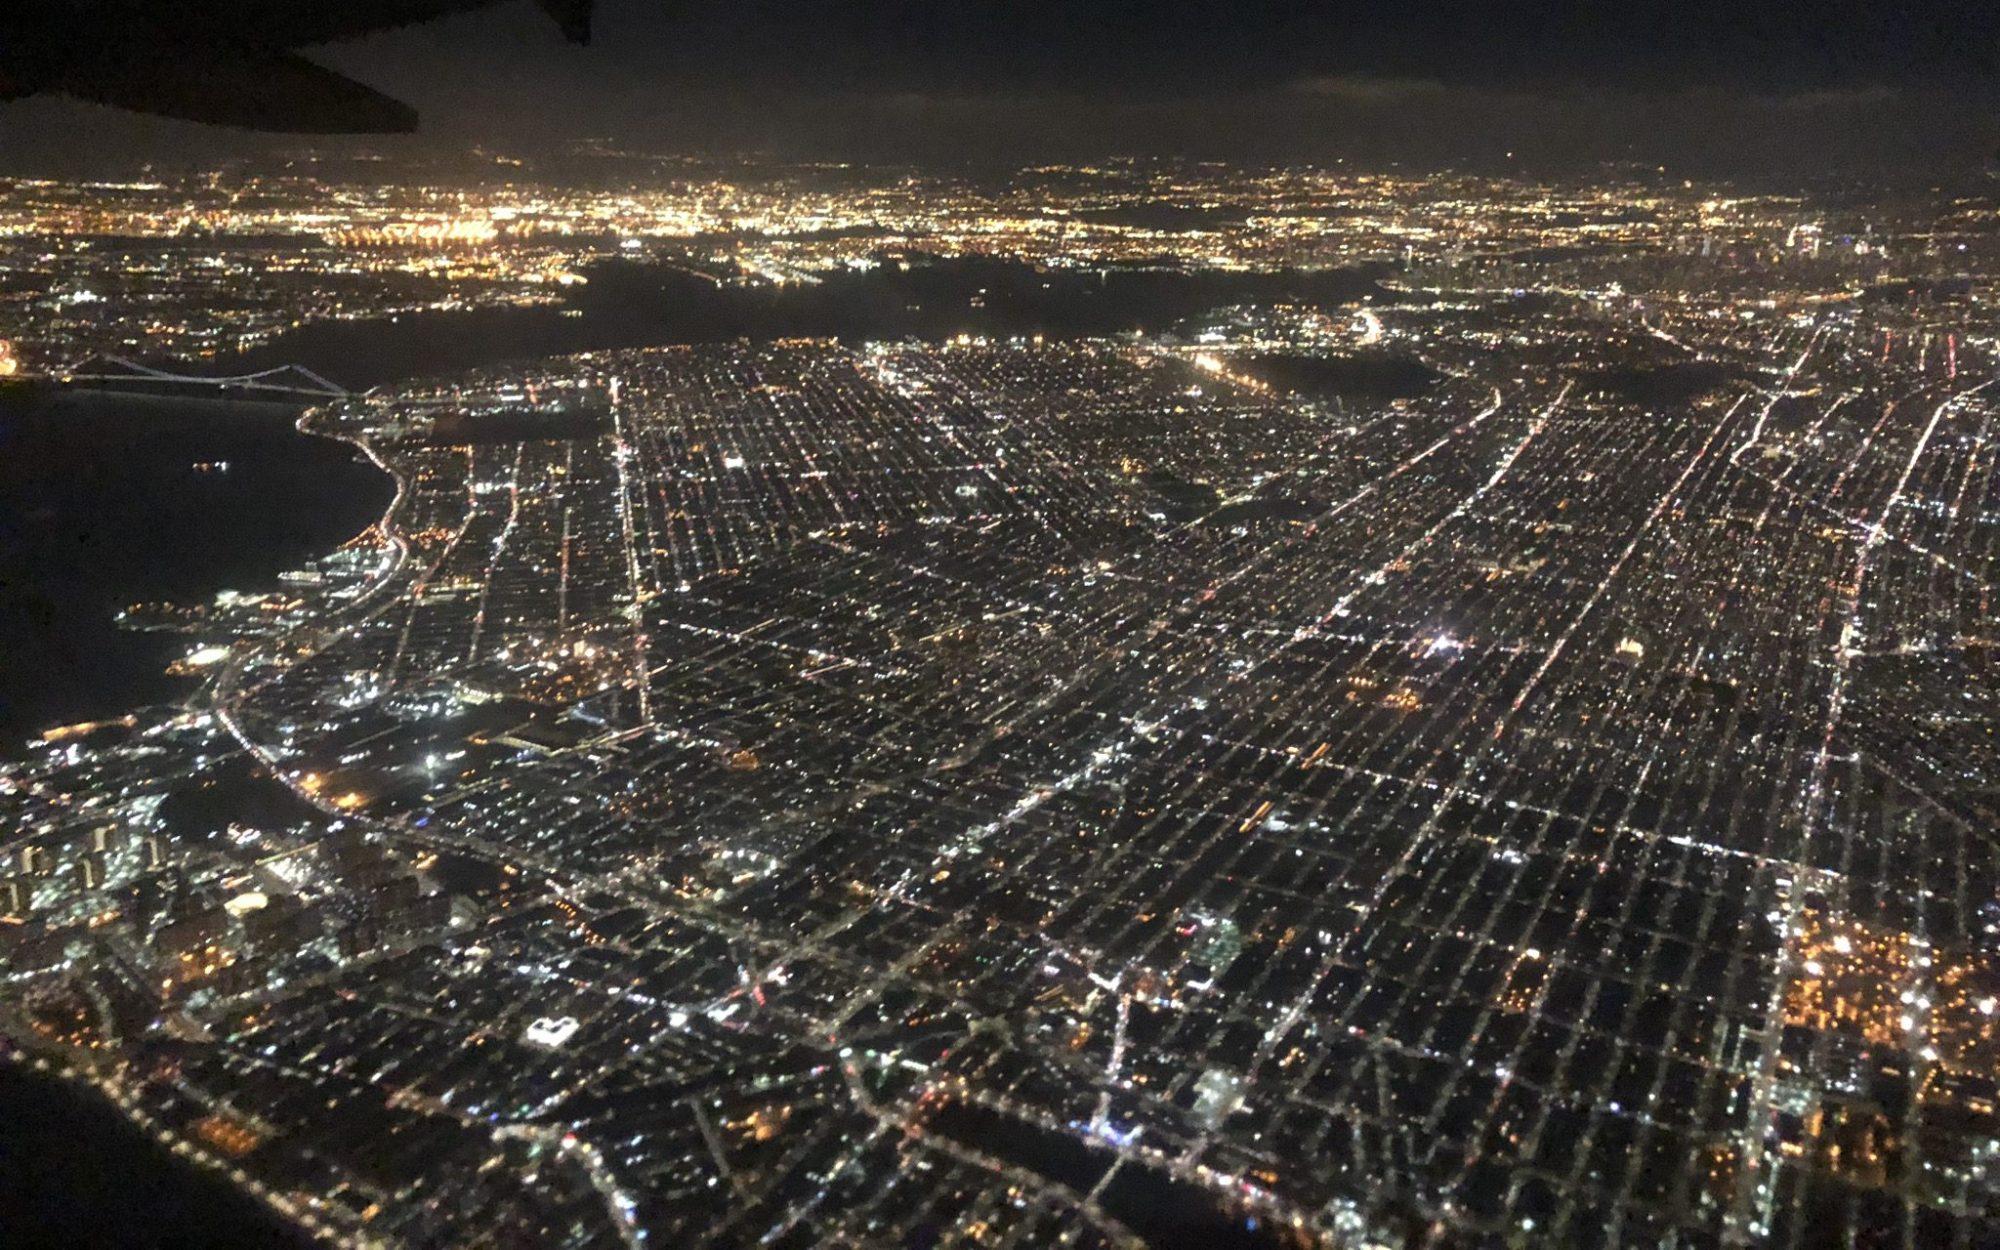 Nowy Jork, noc